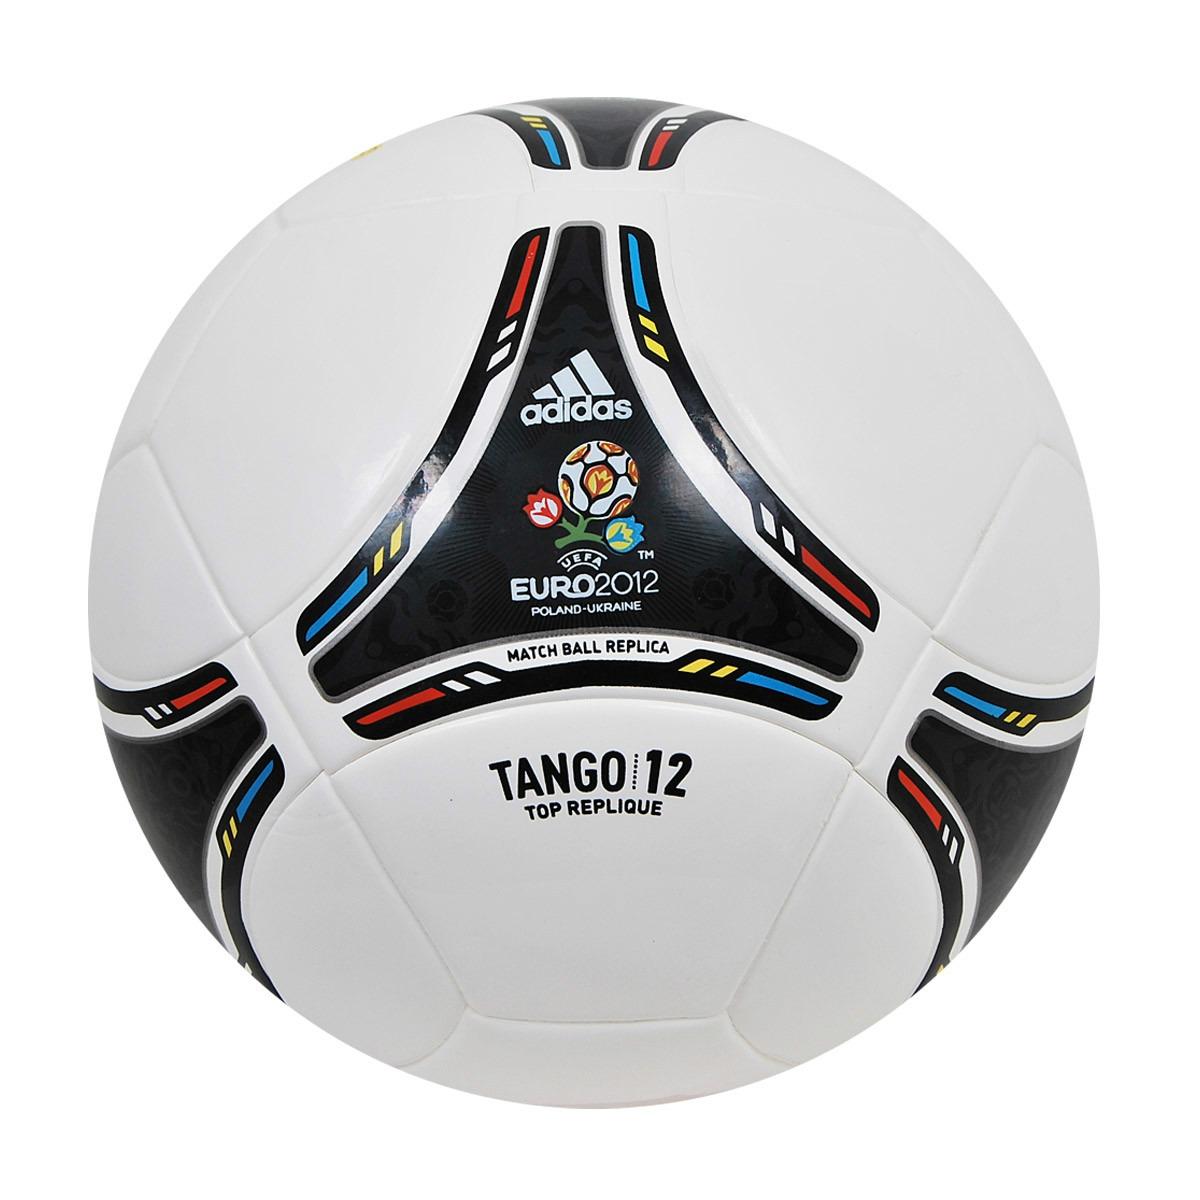 Bola Adidas Euro 2012 – Preços e Onde Comprar3